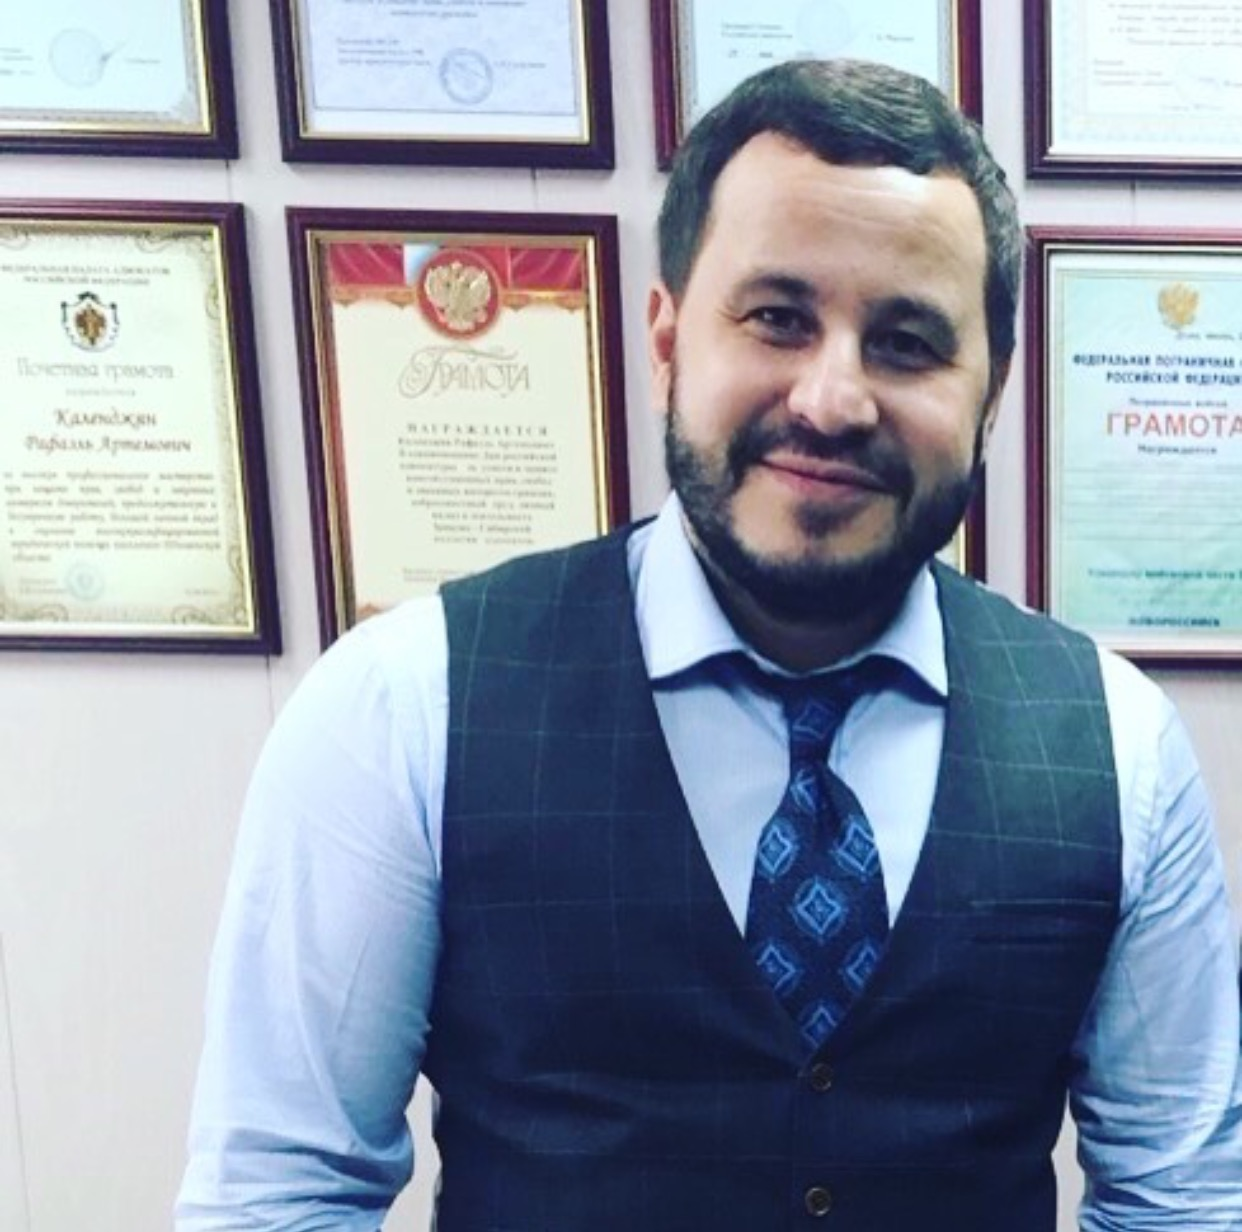 Адвокат Каледжян Р.А.